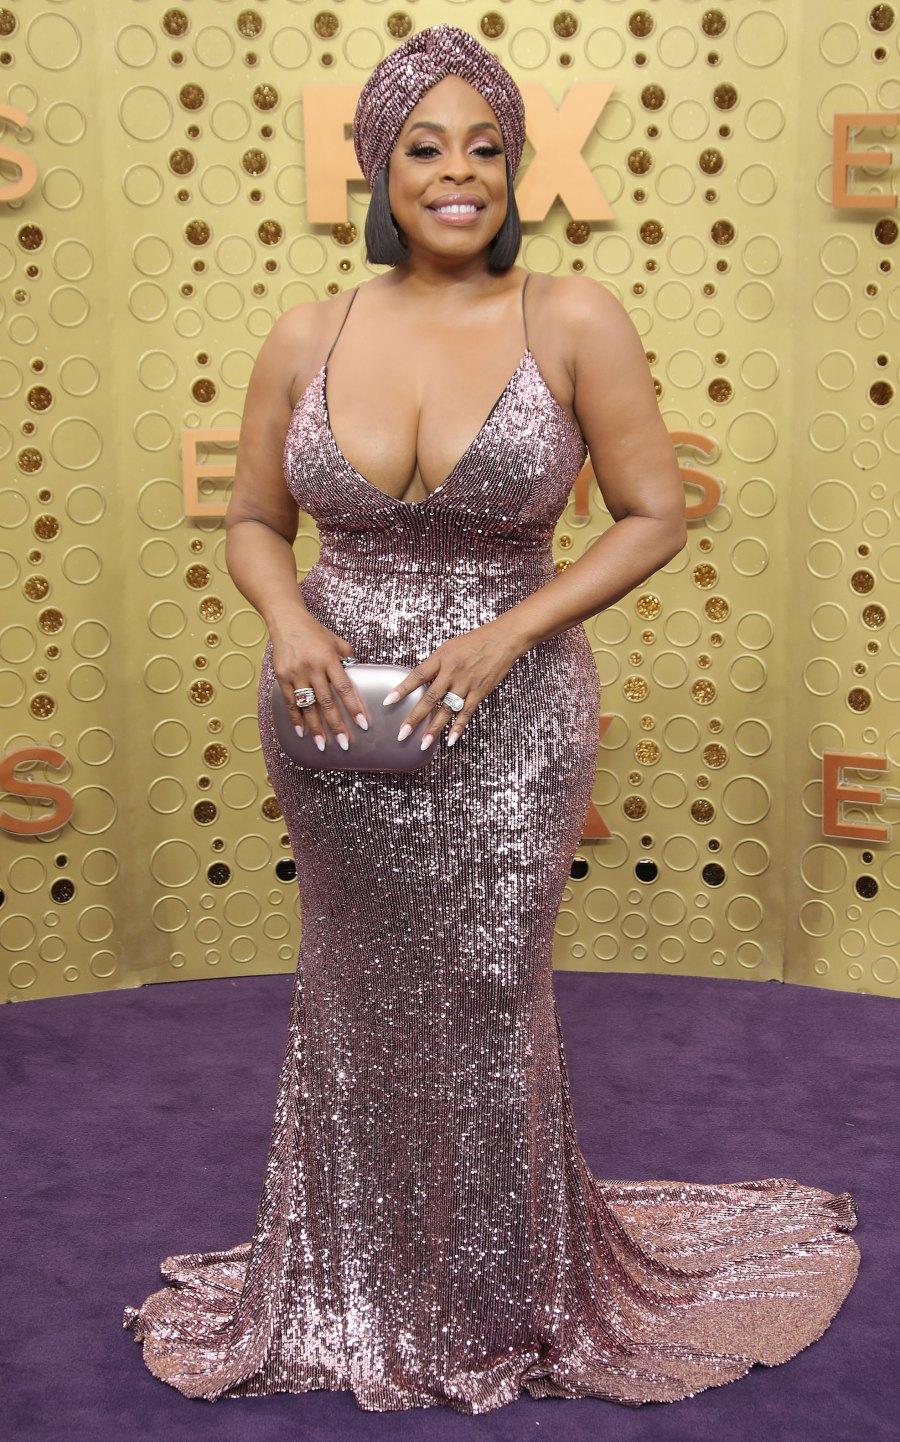 Emmys 2019 Nearly Naked - Niecy Nash